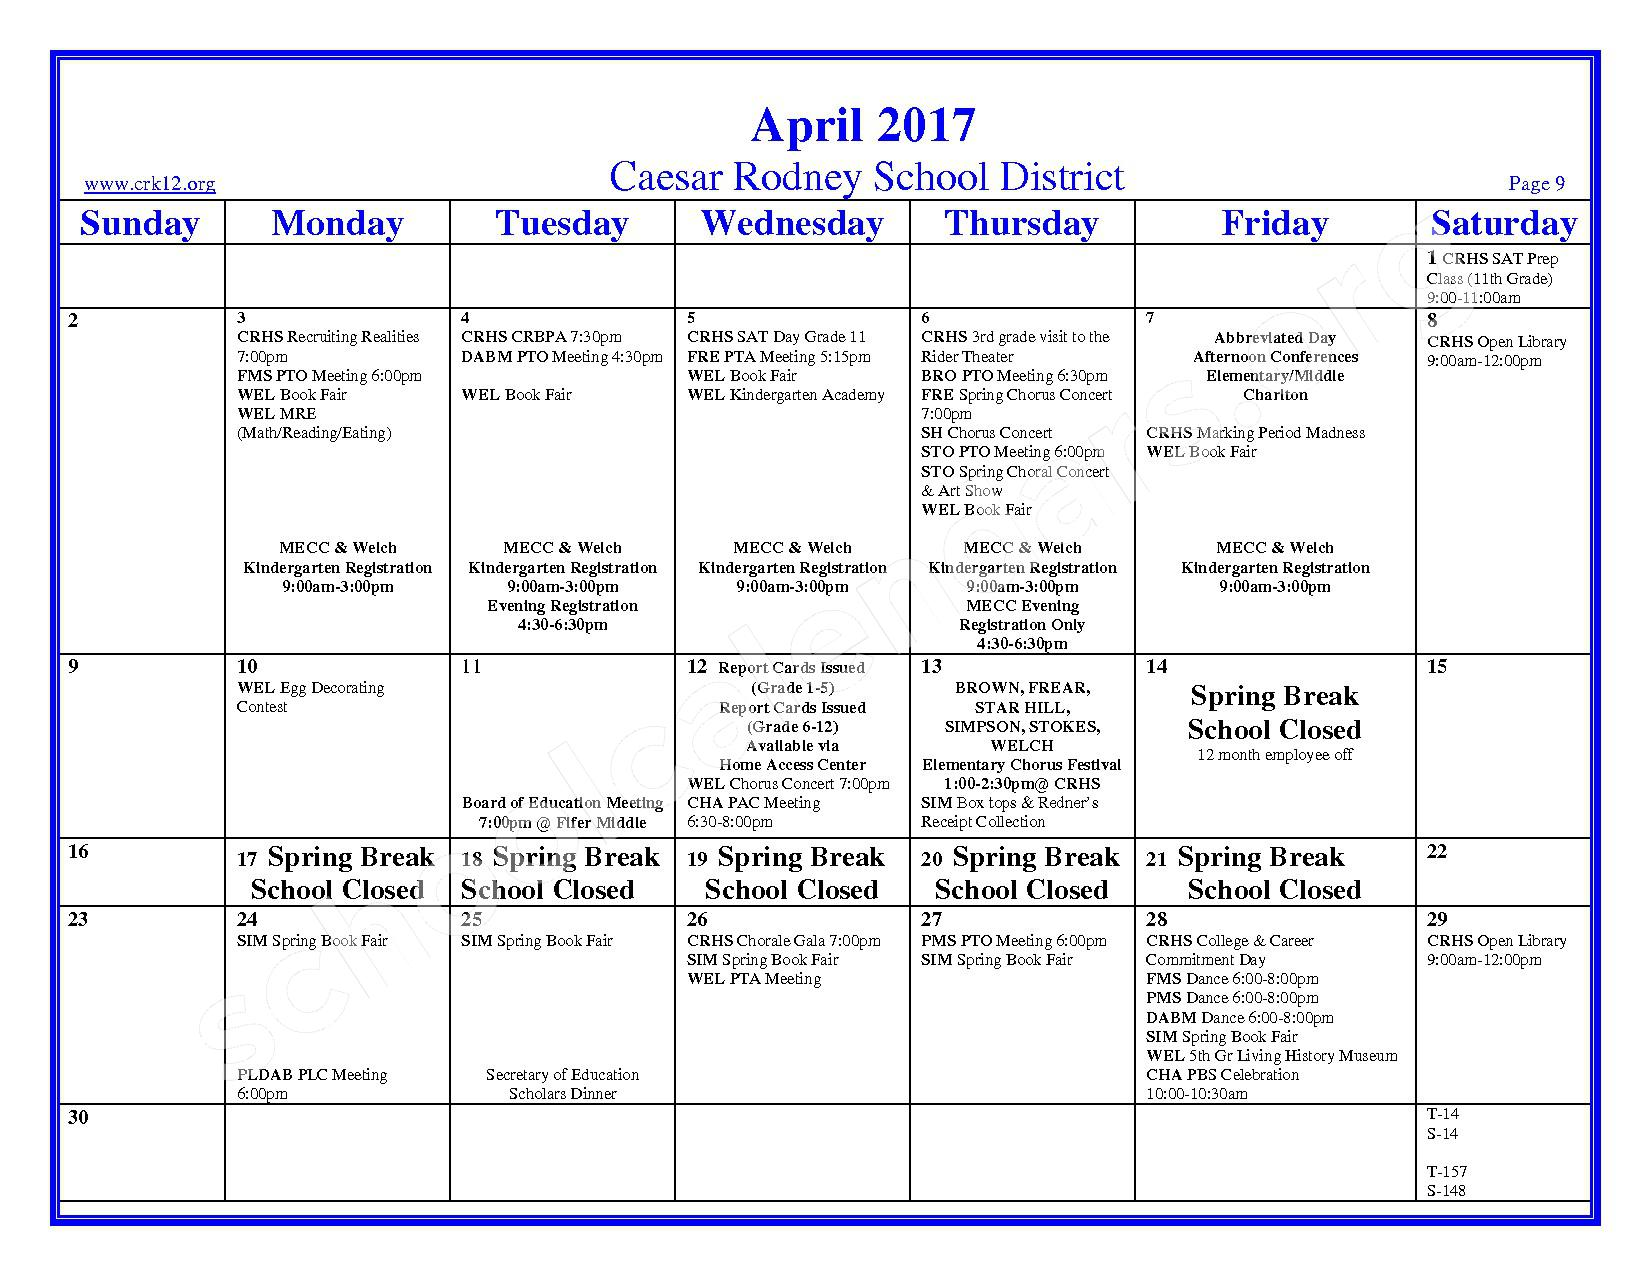 2016 - 2017 School Calendar – Brown (W. Reily) Elementary School – page 9